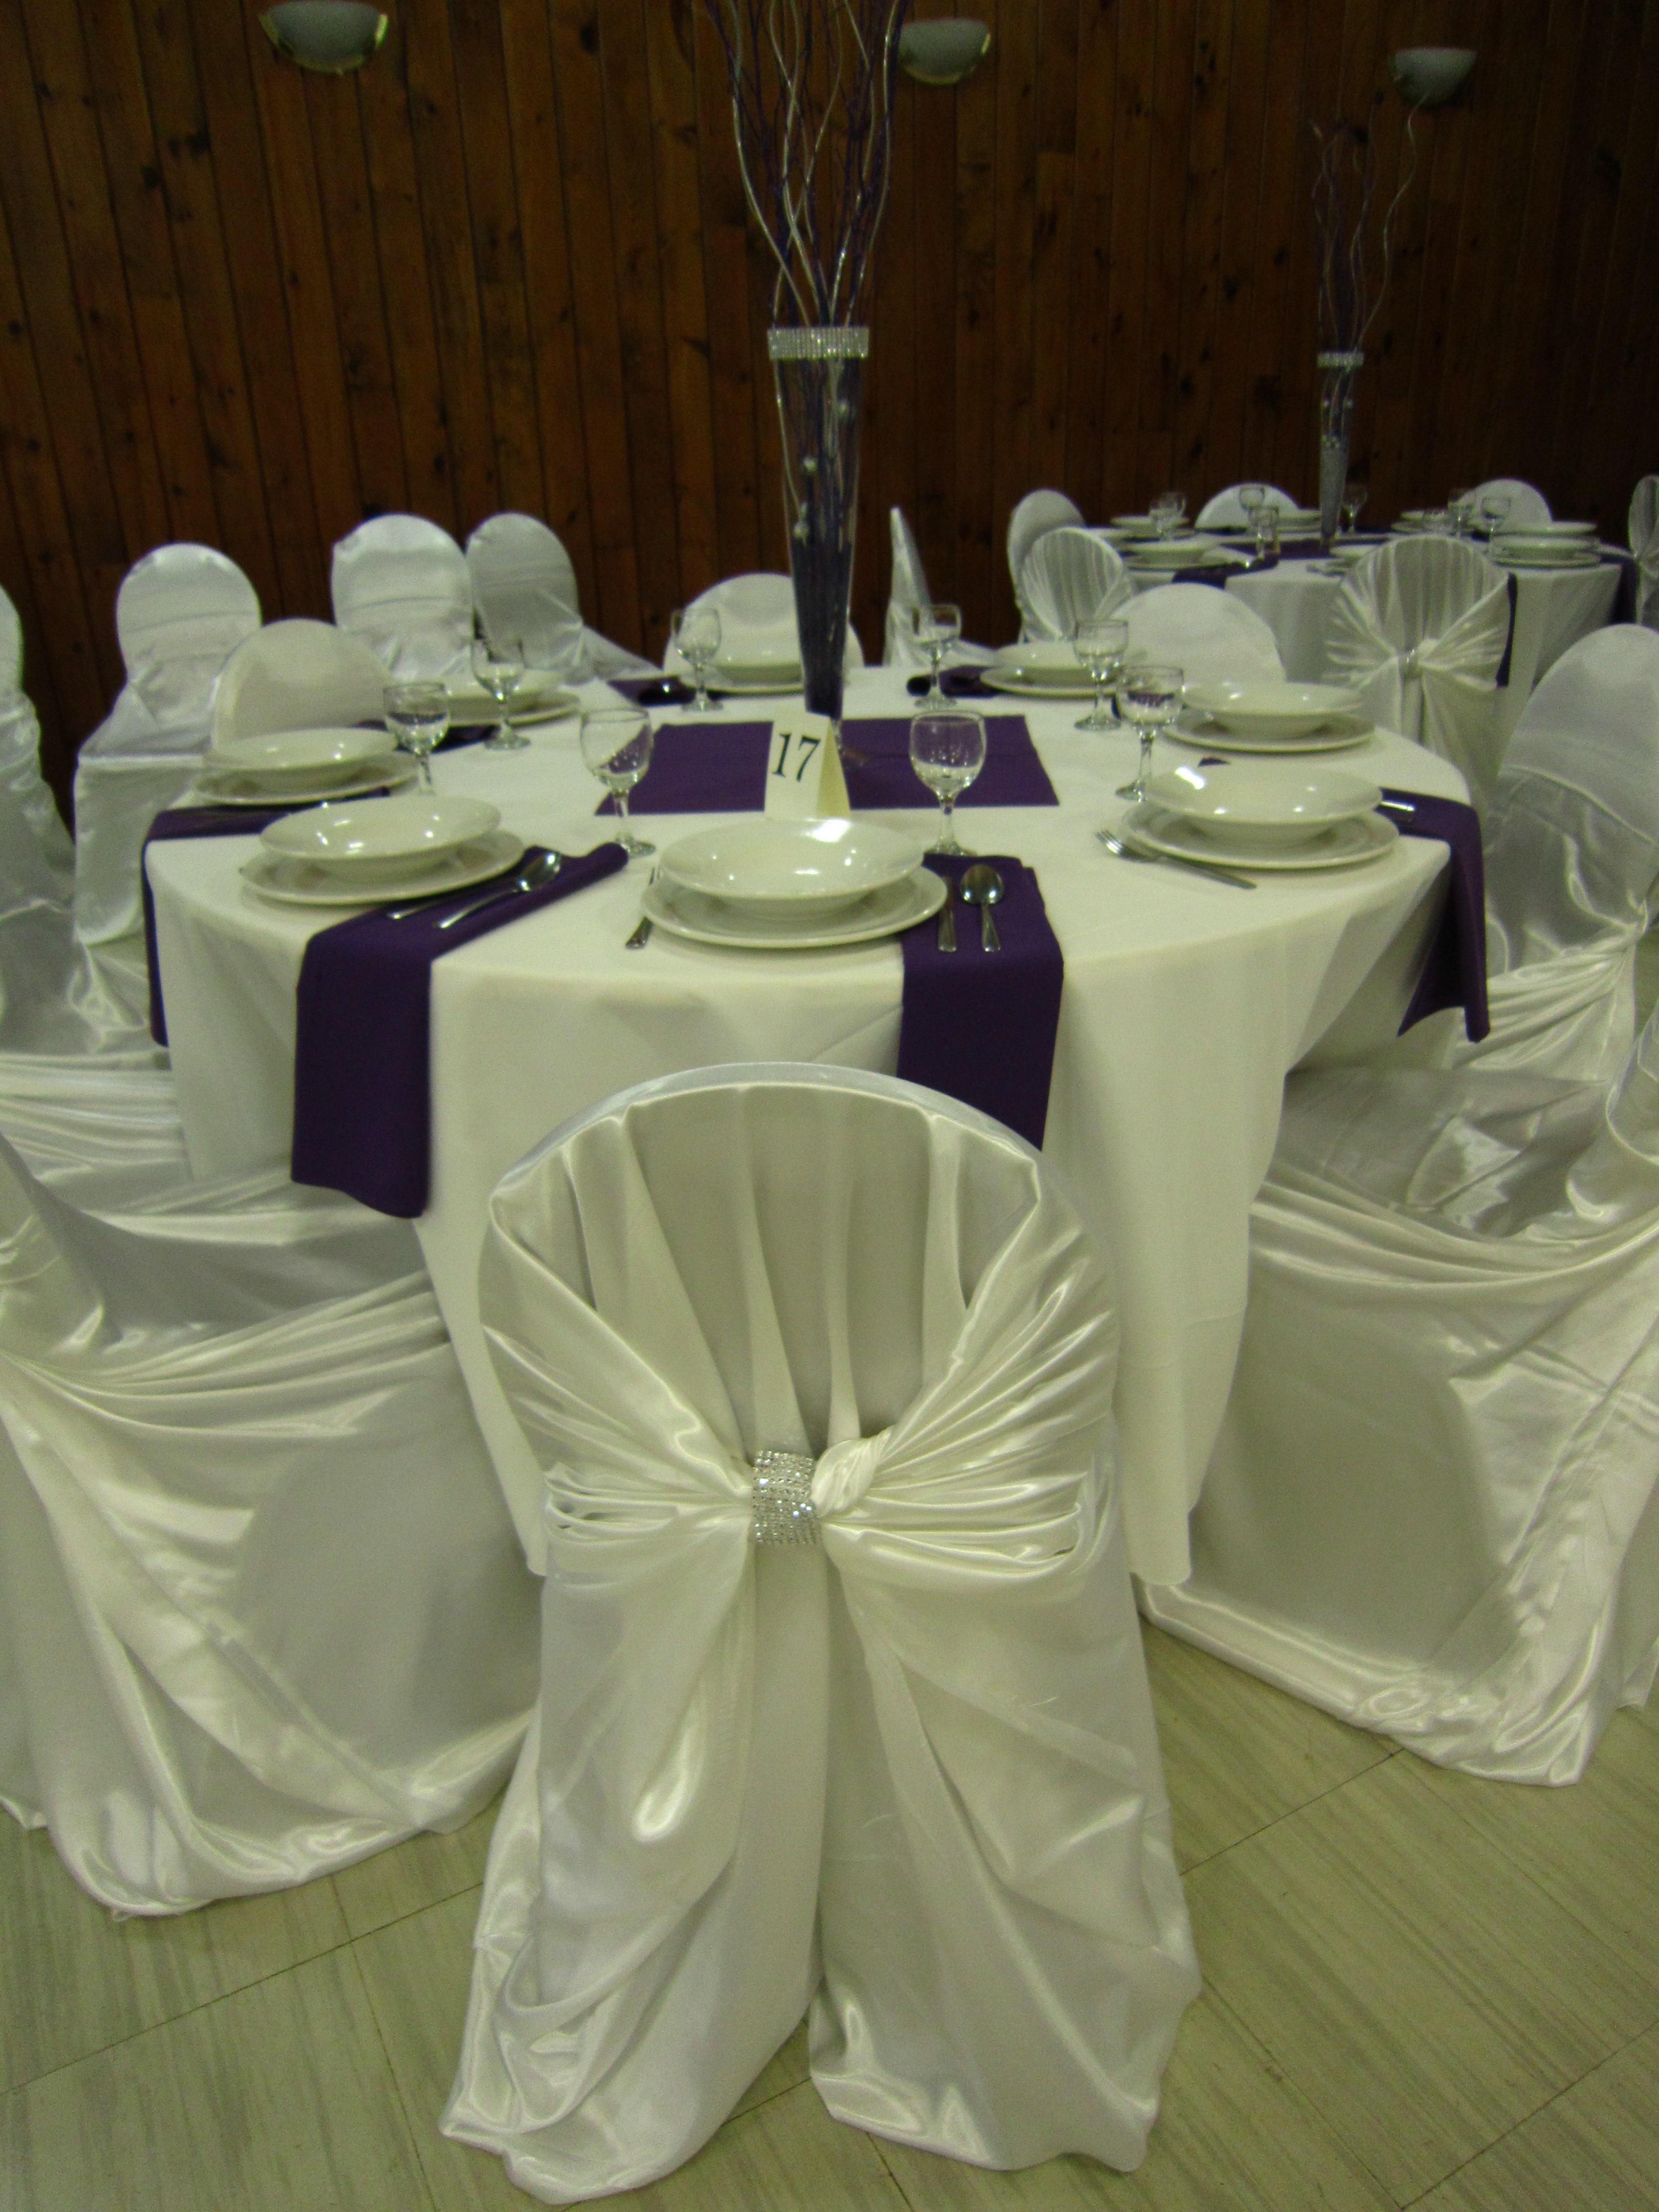 chair covers hamilton ontario swing home depot white satin set the mood decor